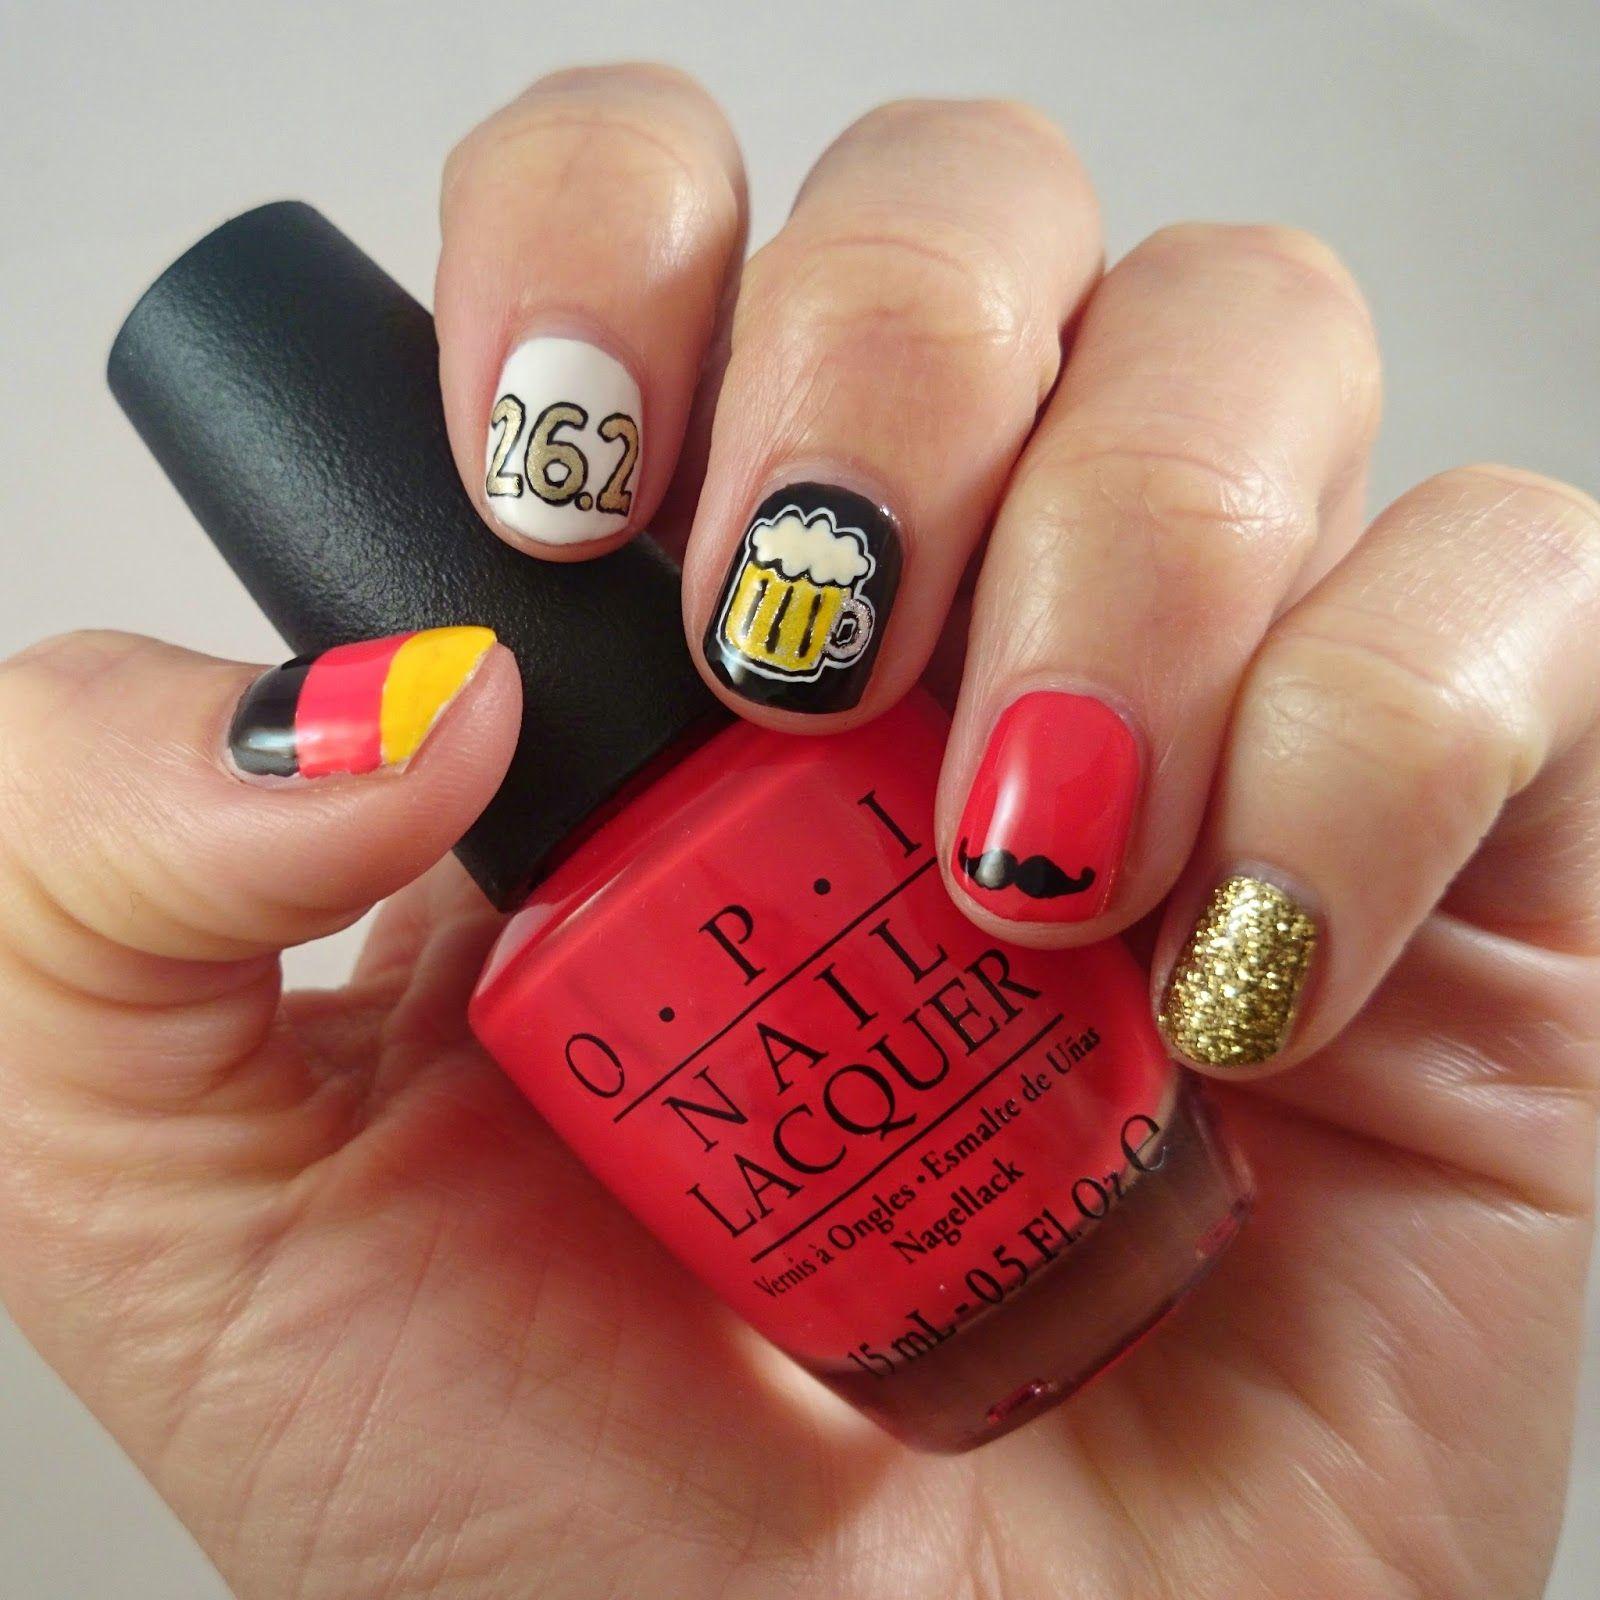 Berlin Marathon Nail Art | Nail Can Do | Pinterest | Marathons and ...